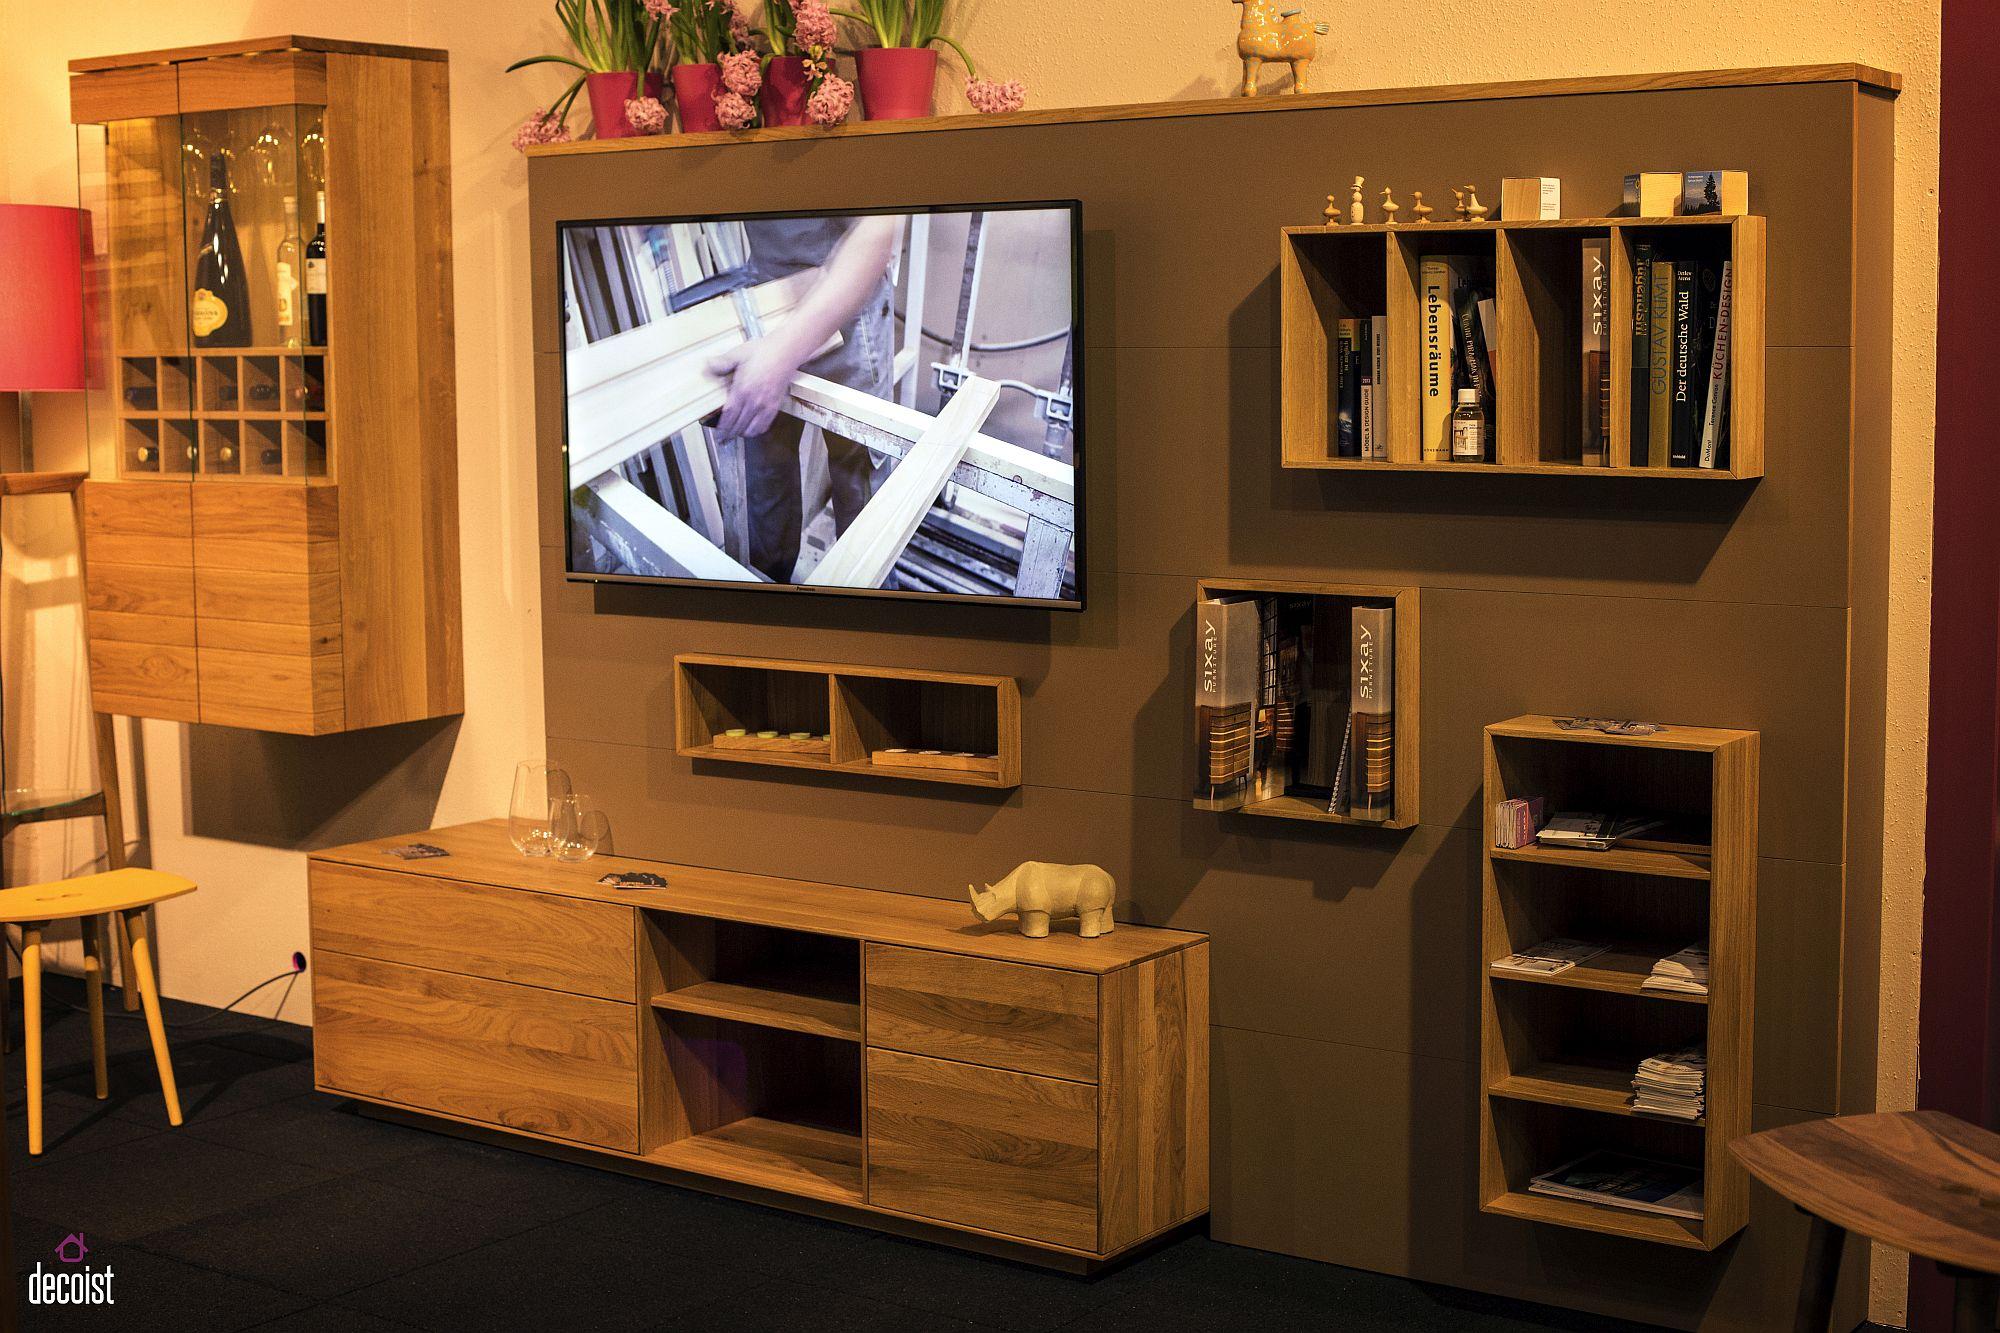 Series of open shelves in the living room combine ergonomics with aesthetics